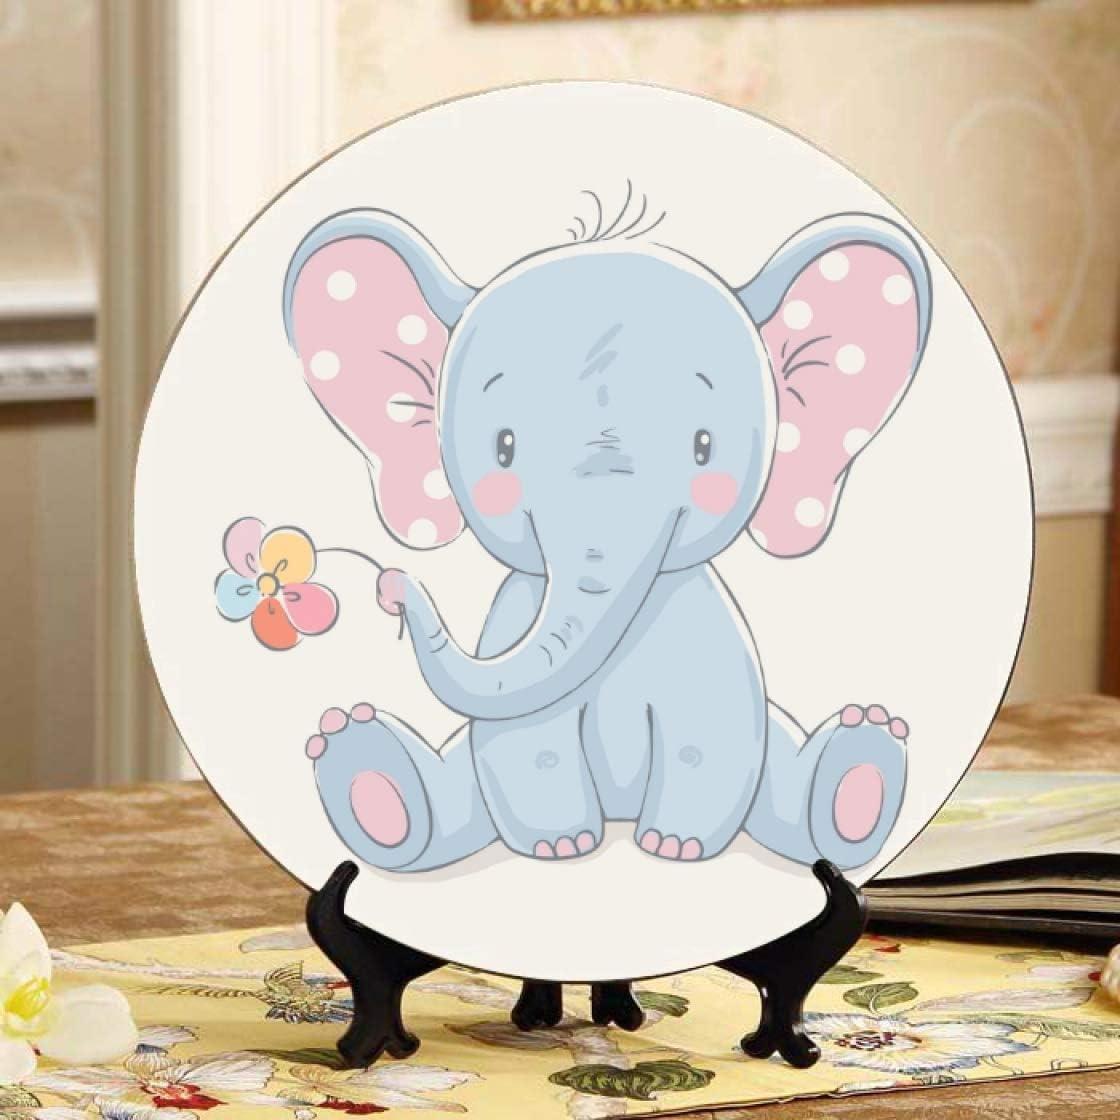 ALALAL Cute Animation Elephant Ceramic Custom Ceram Max 47% OFF Ranking TOP11 Plates Decor